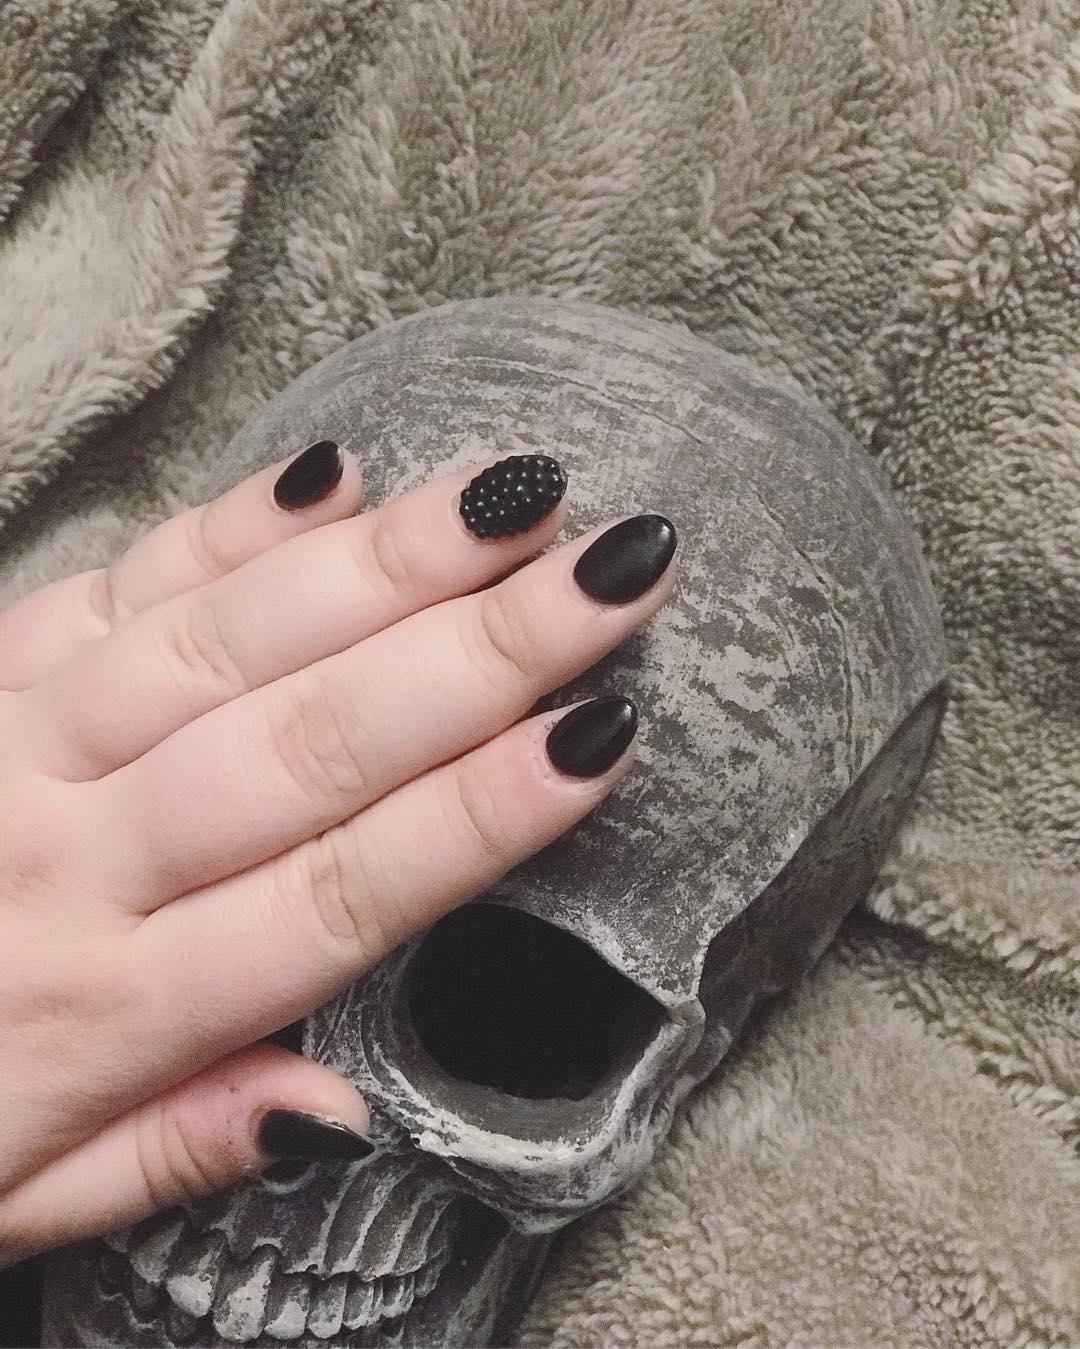 elegant black nail designs 2019 1 - Elegant Black Nail Designs 2019